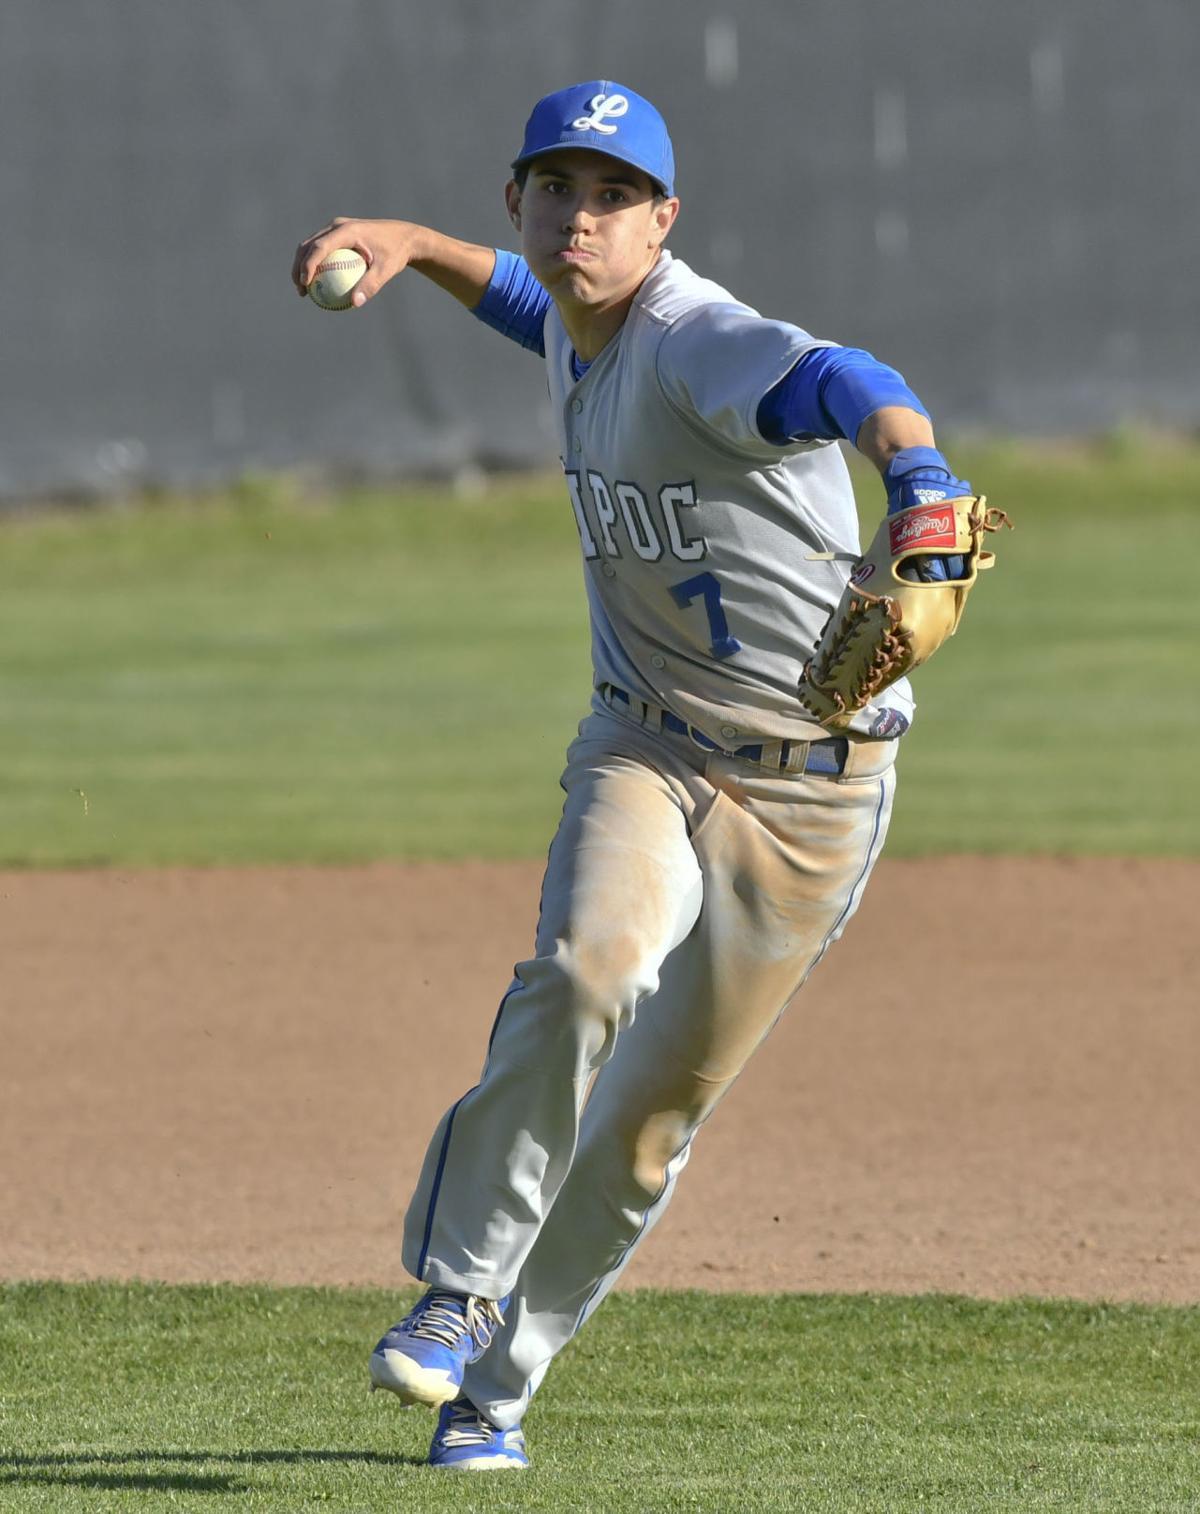 041718 Lompoc SY baseball 04.jpg